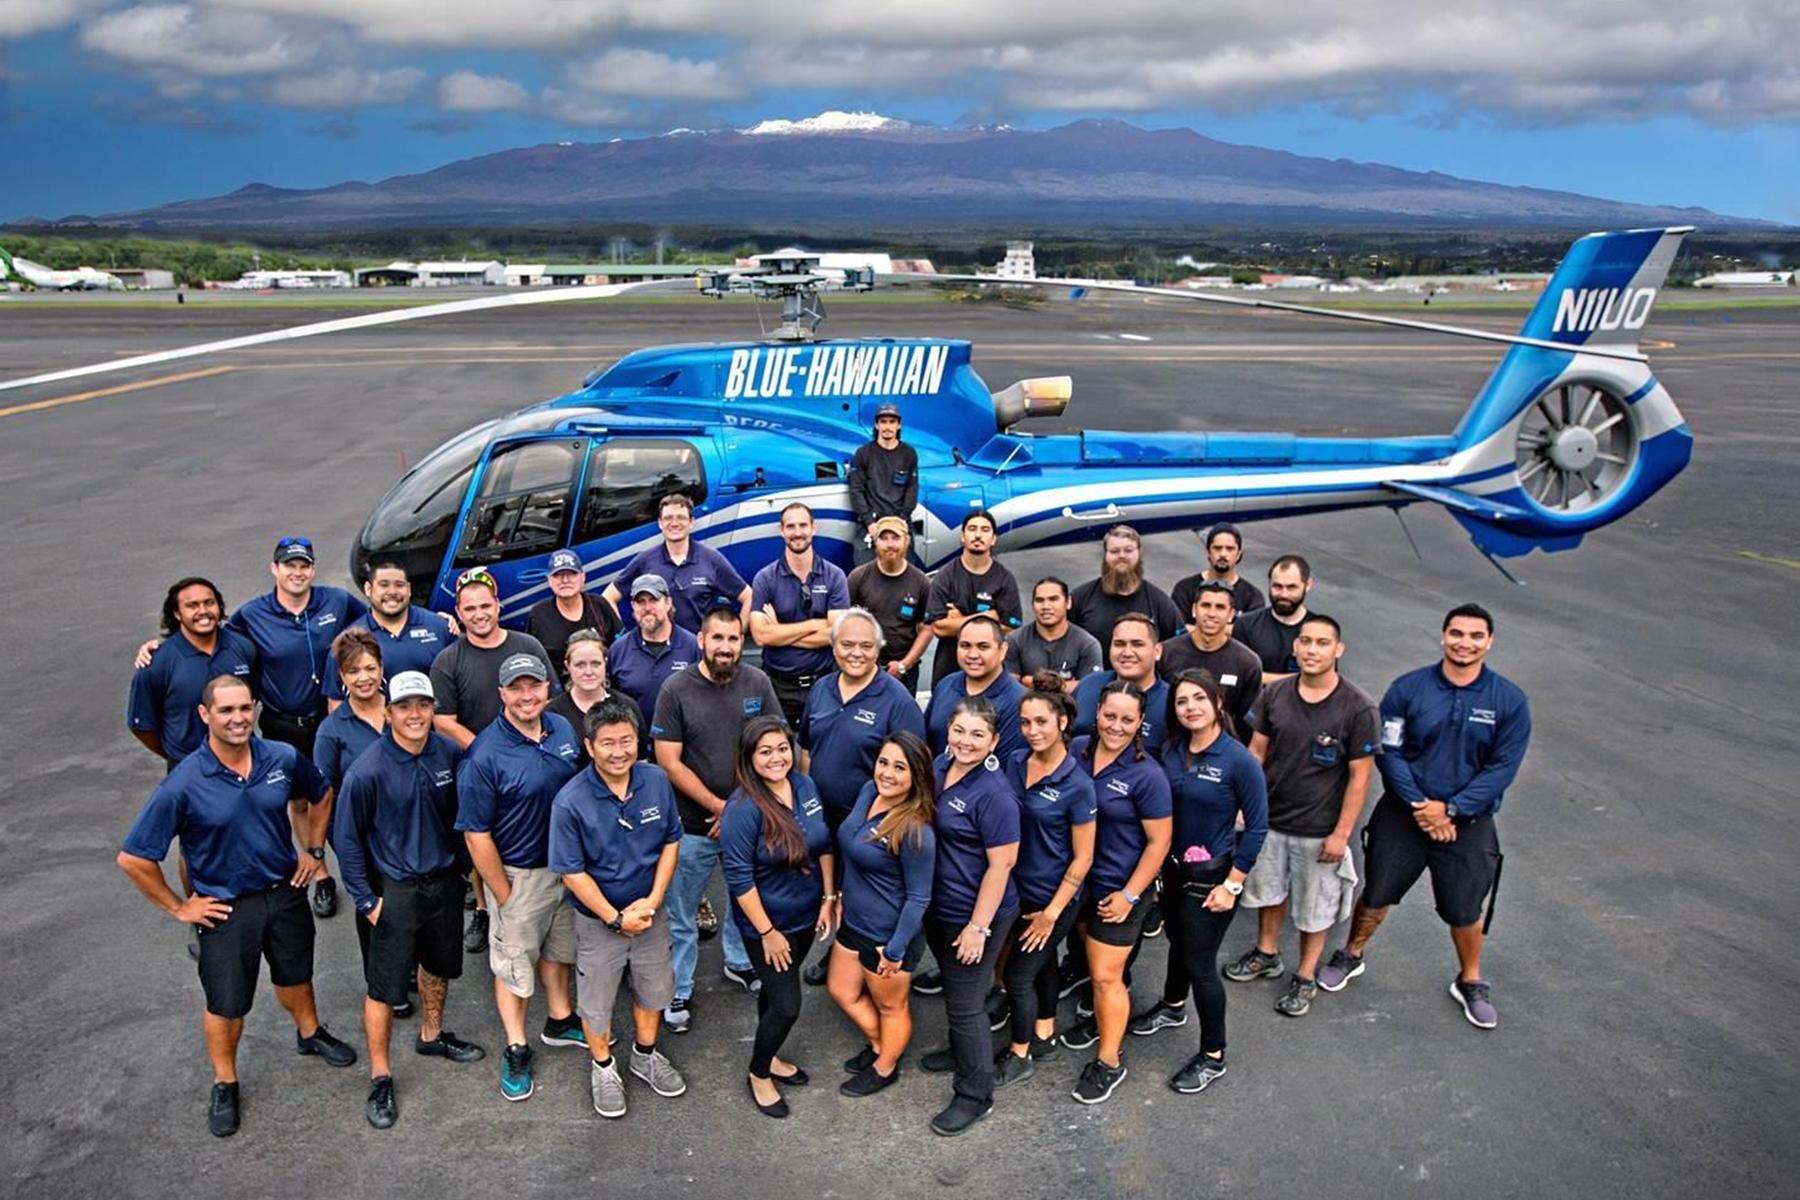 Blue Hawaiian Helicopter Team